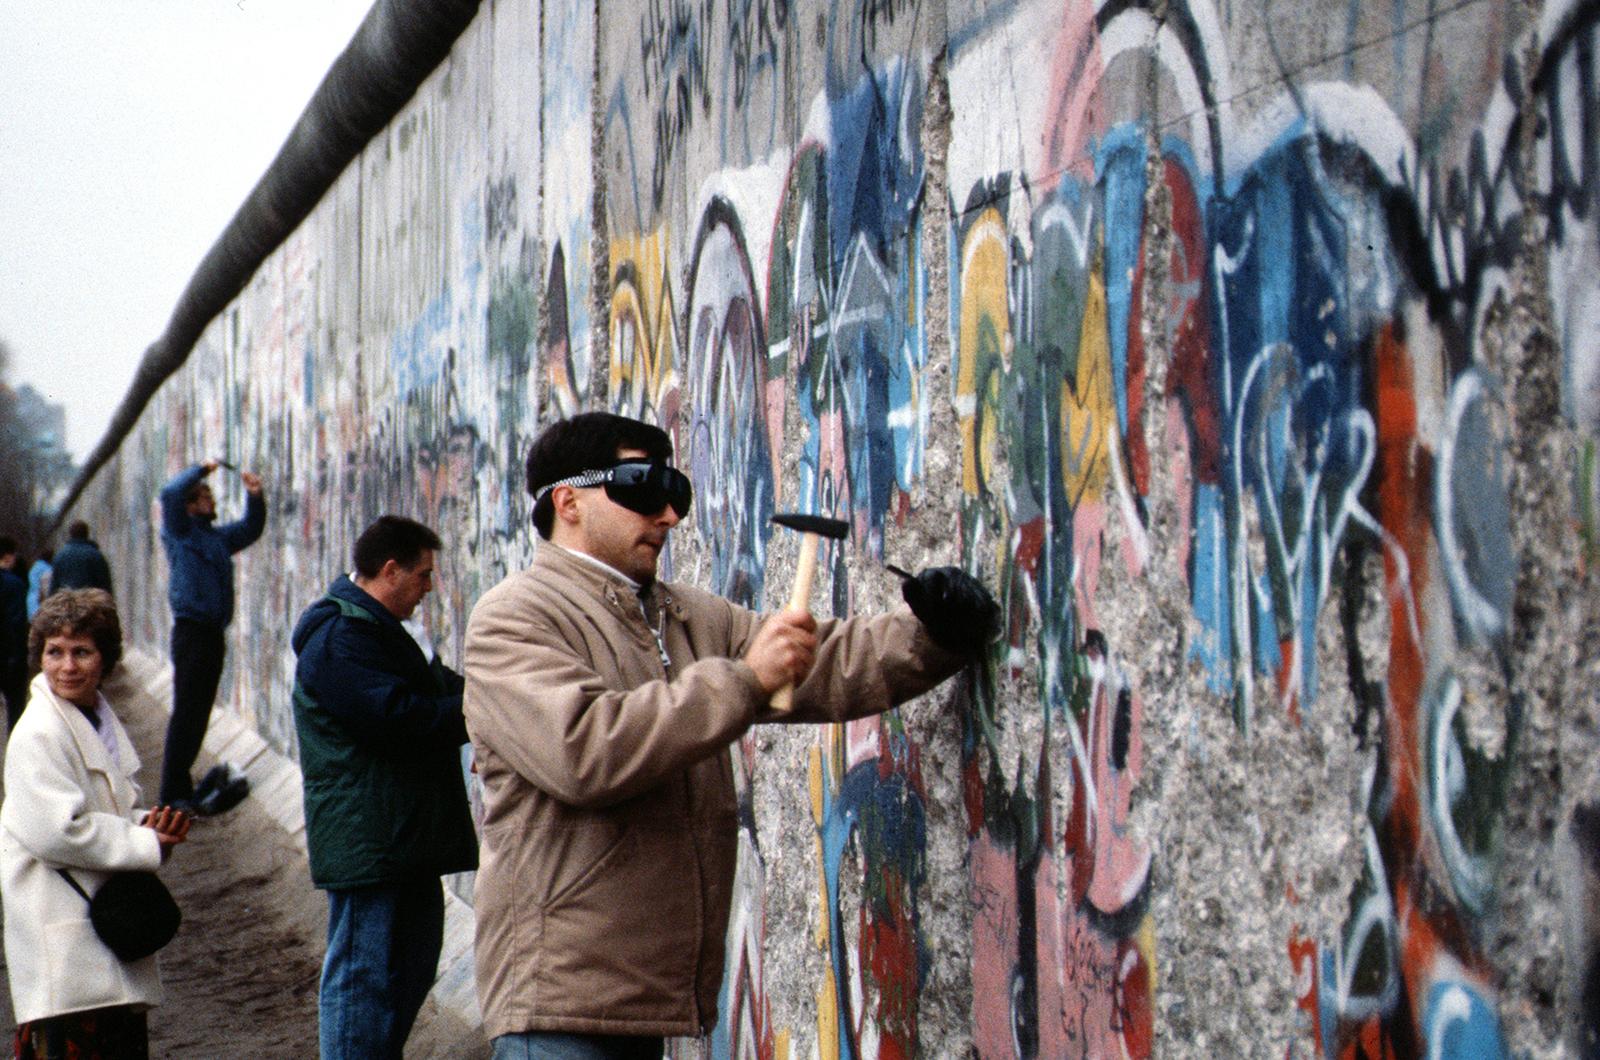 People tearing down the Berlin Wall, 1989